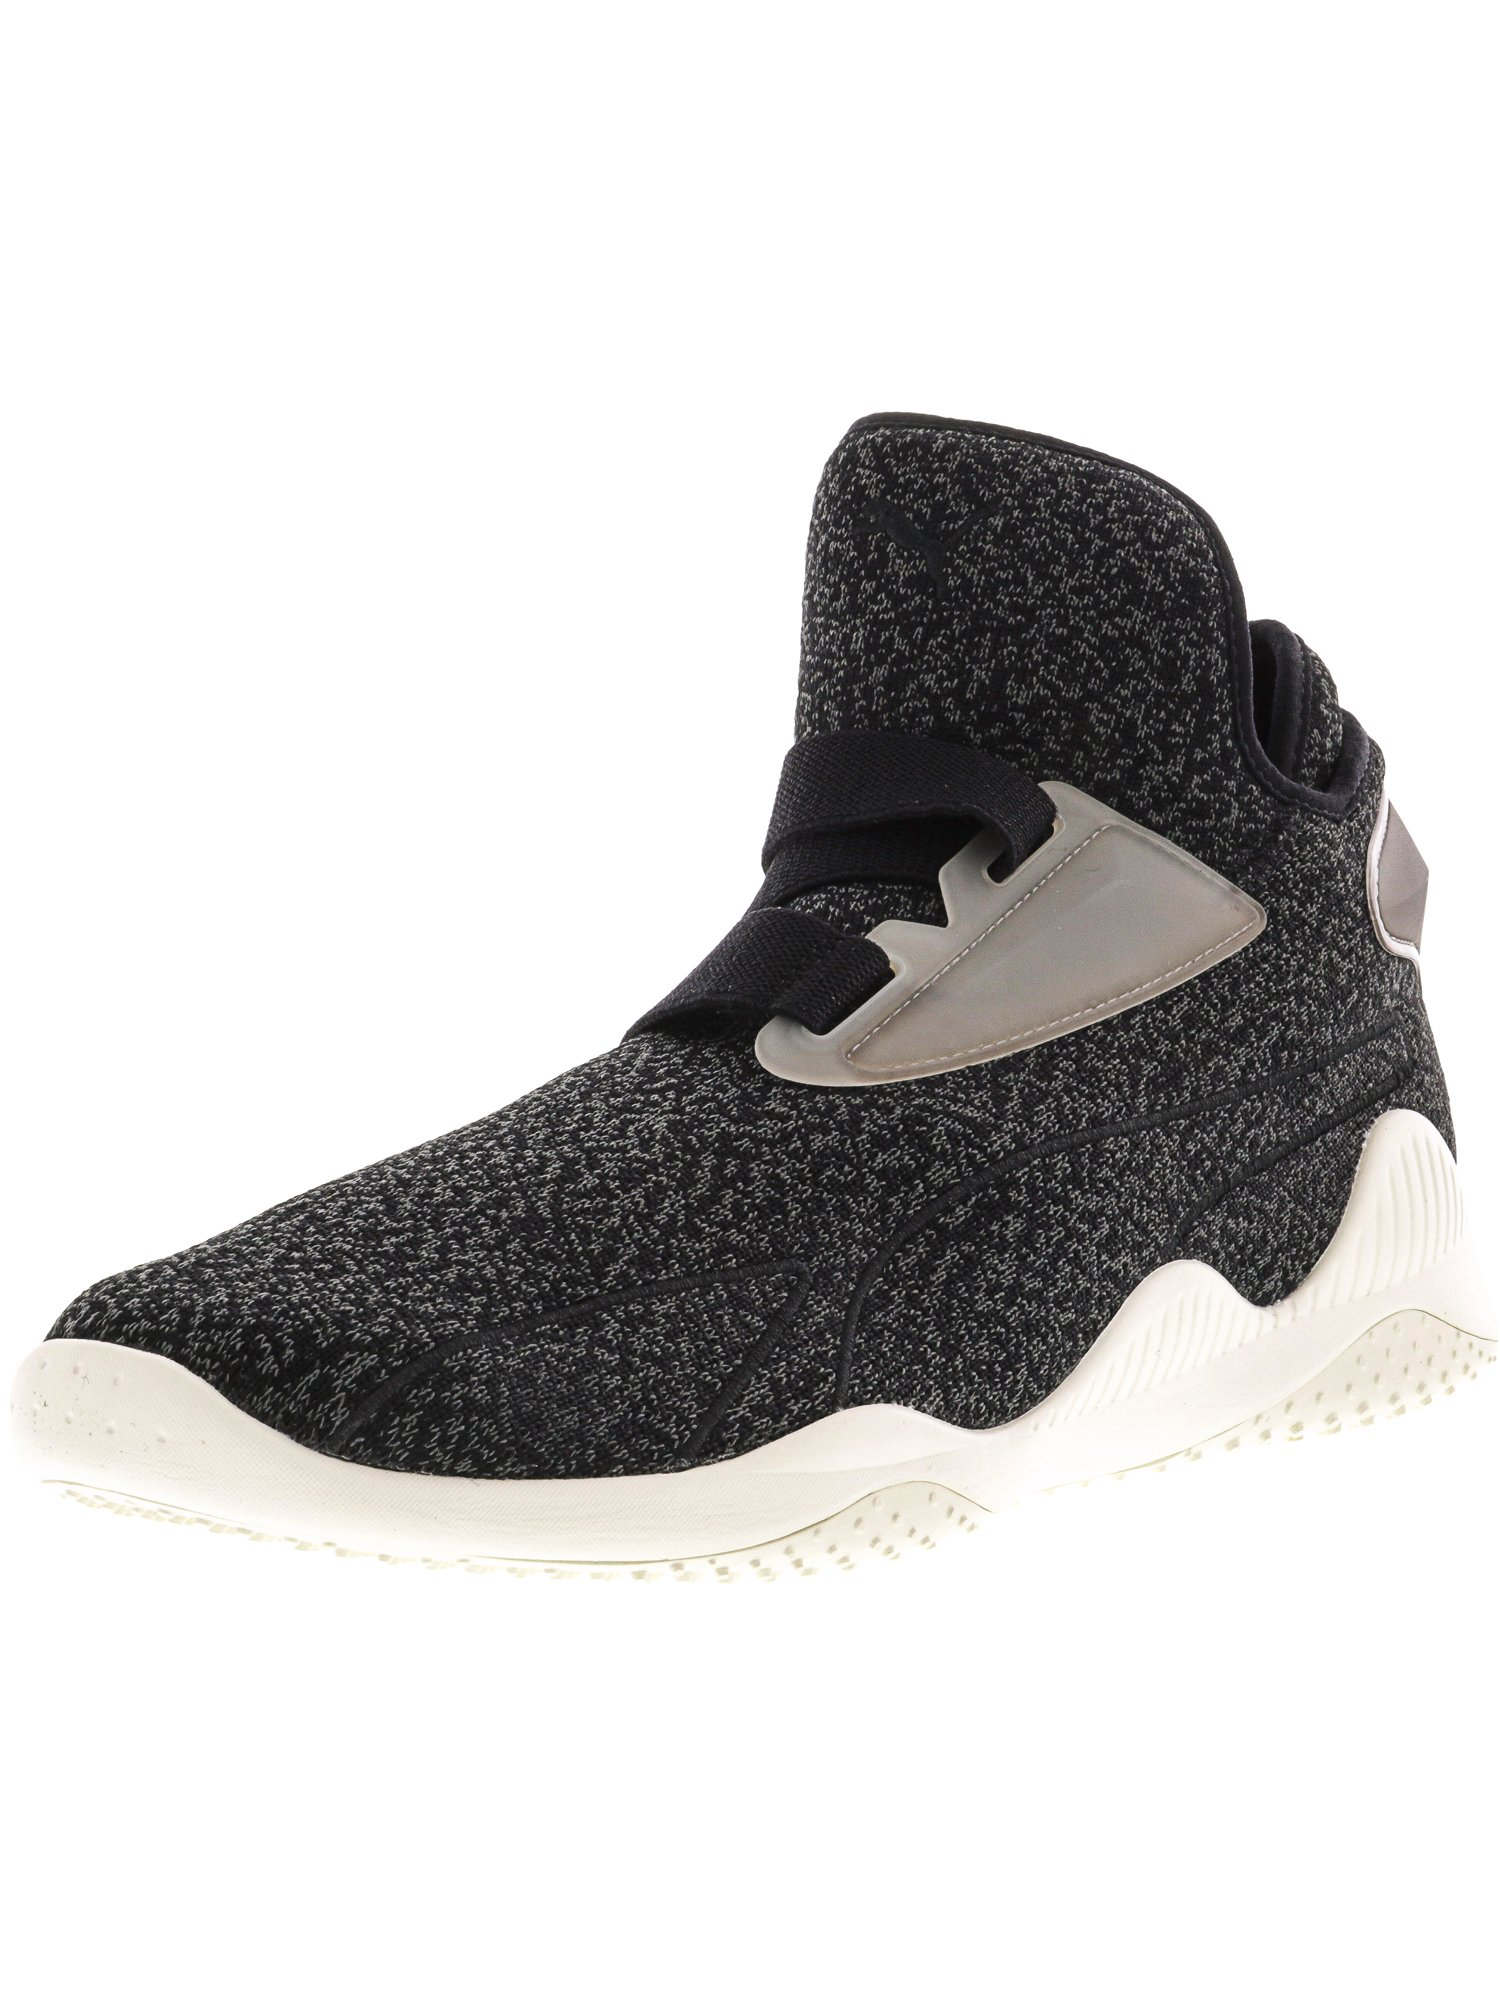 Puma Men's Mostro Sirsa Elemental Black / Dark Shadow Whisper White Ankle-High Fashion Sneaker - 7M